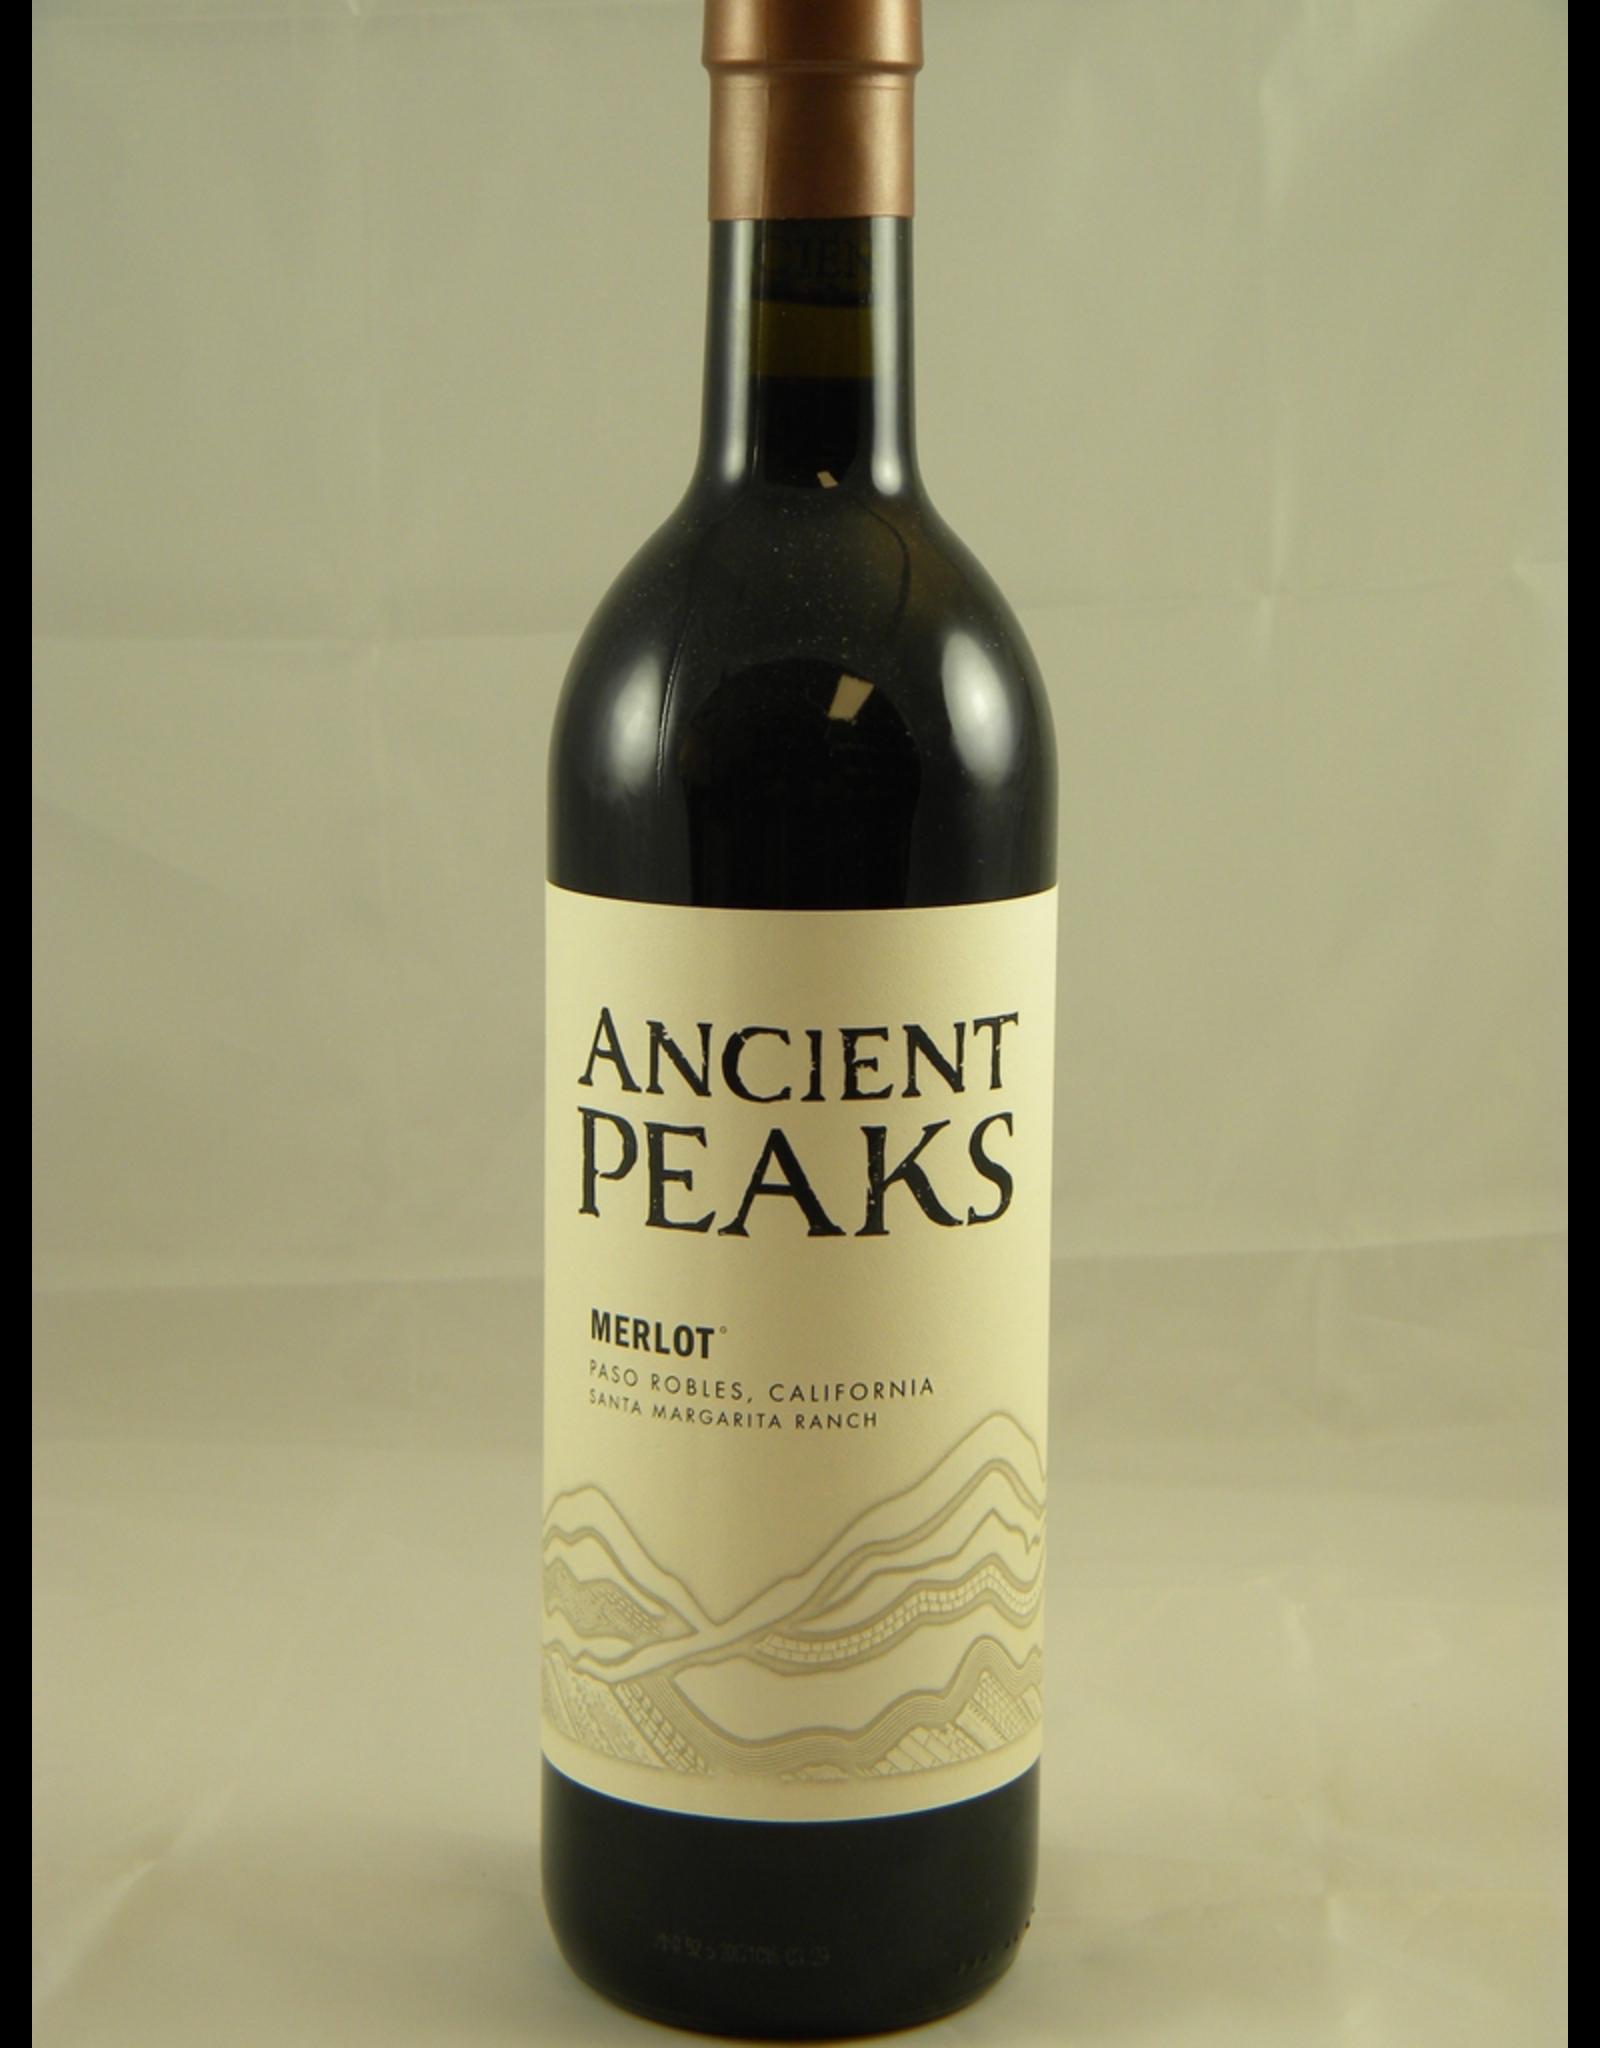 Ancient Peaks Ancient Peaks Merlot Paso Robles Santa Margarita Ranch 2018